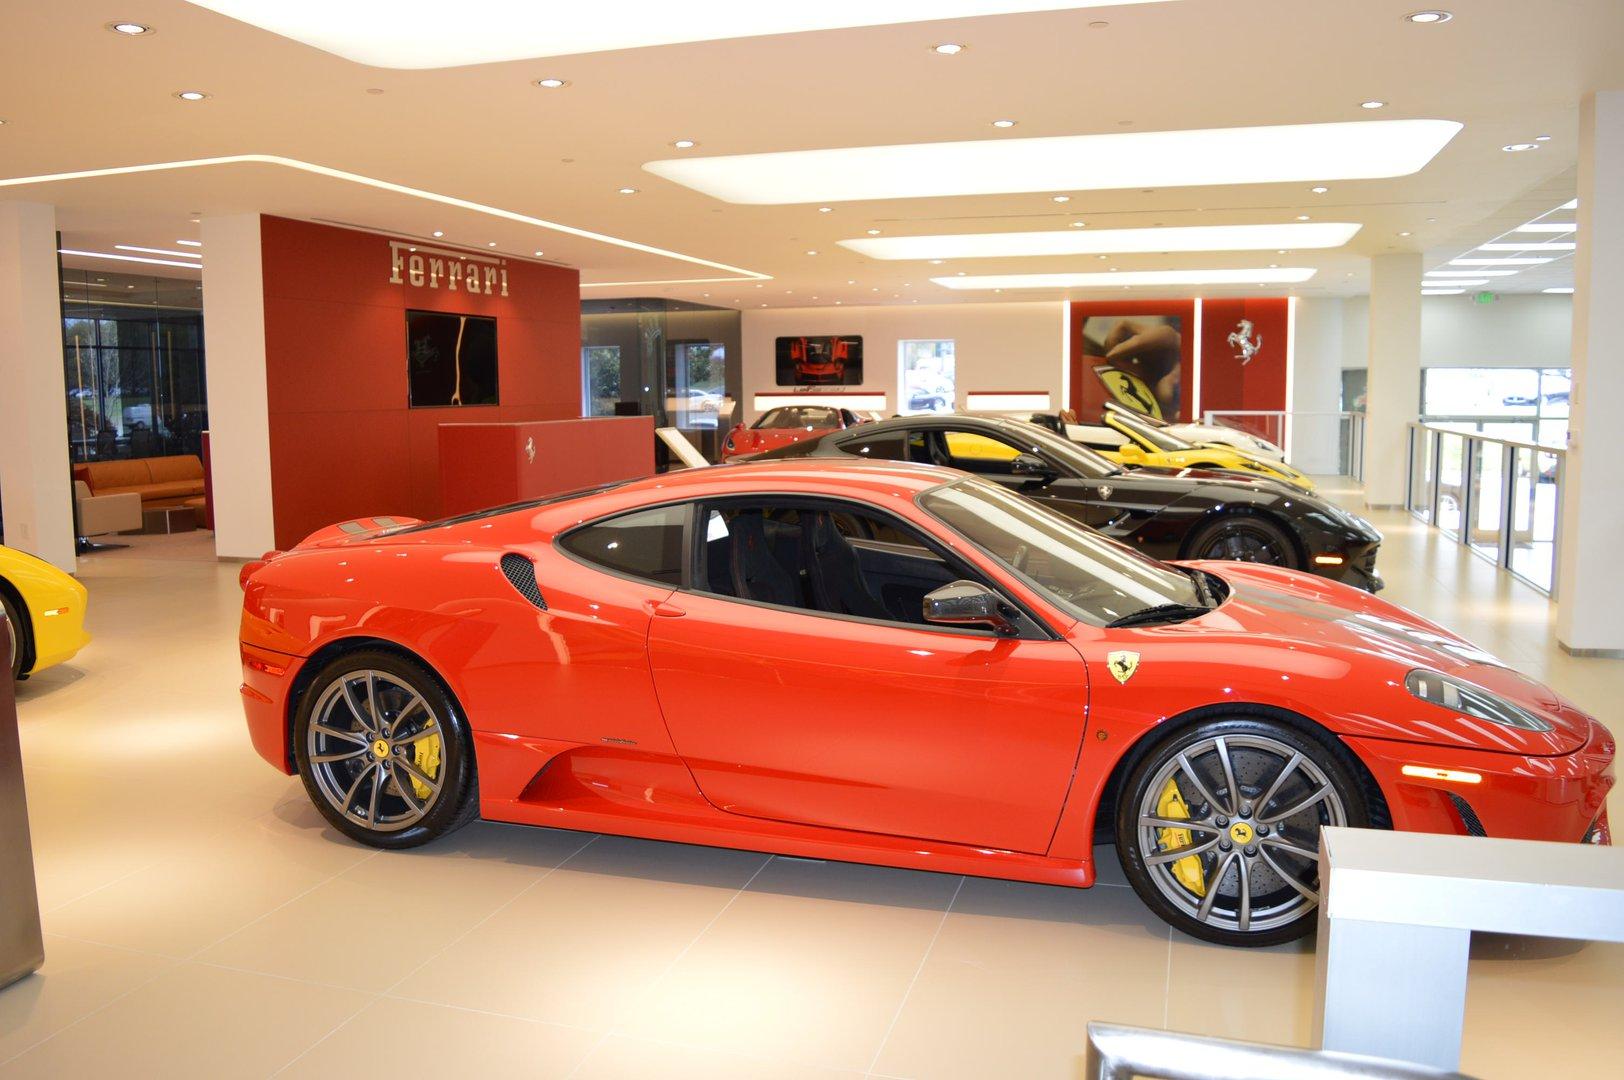 Paramount Ferrari, Greensboro